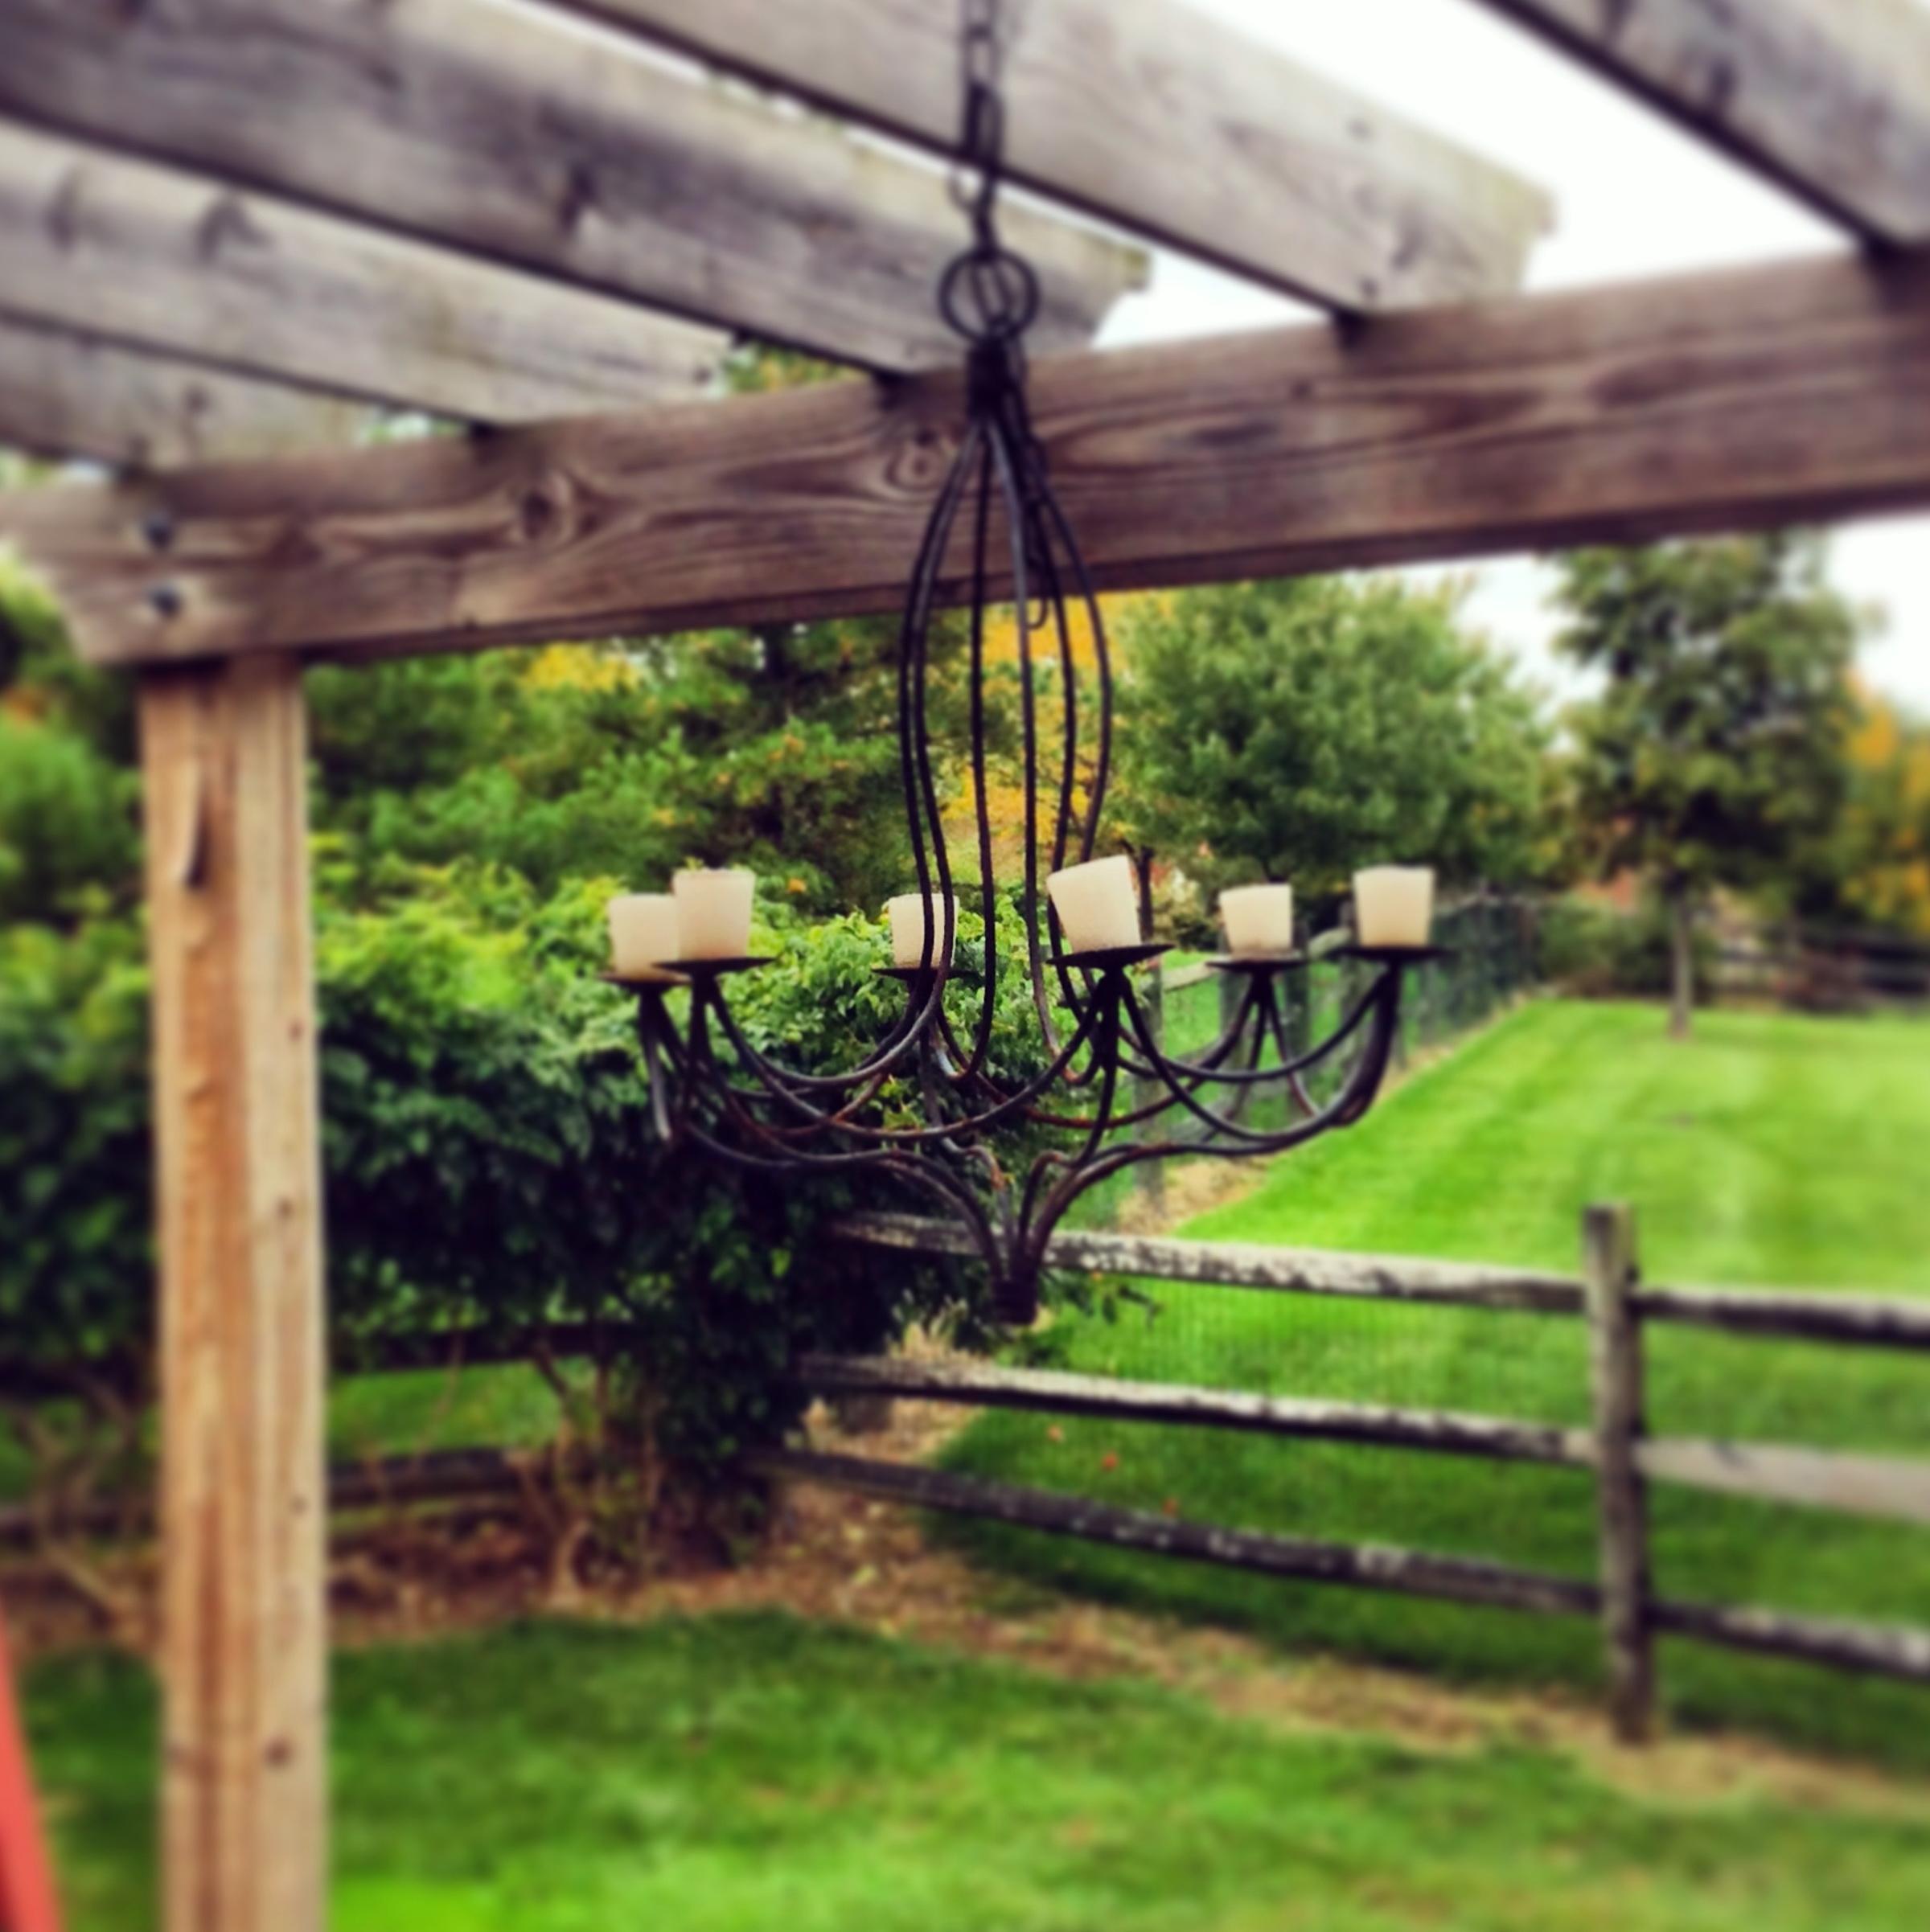 Home Depot Yard Design: Outdoor Candle Chandelier Home Depot